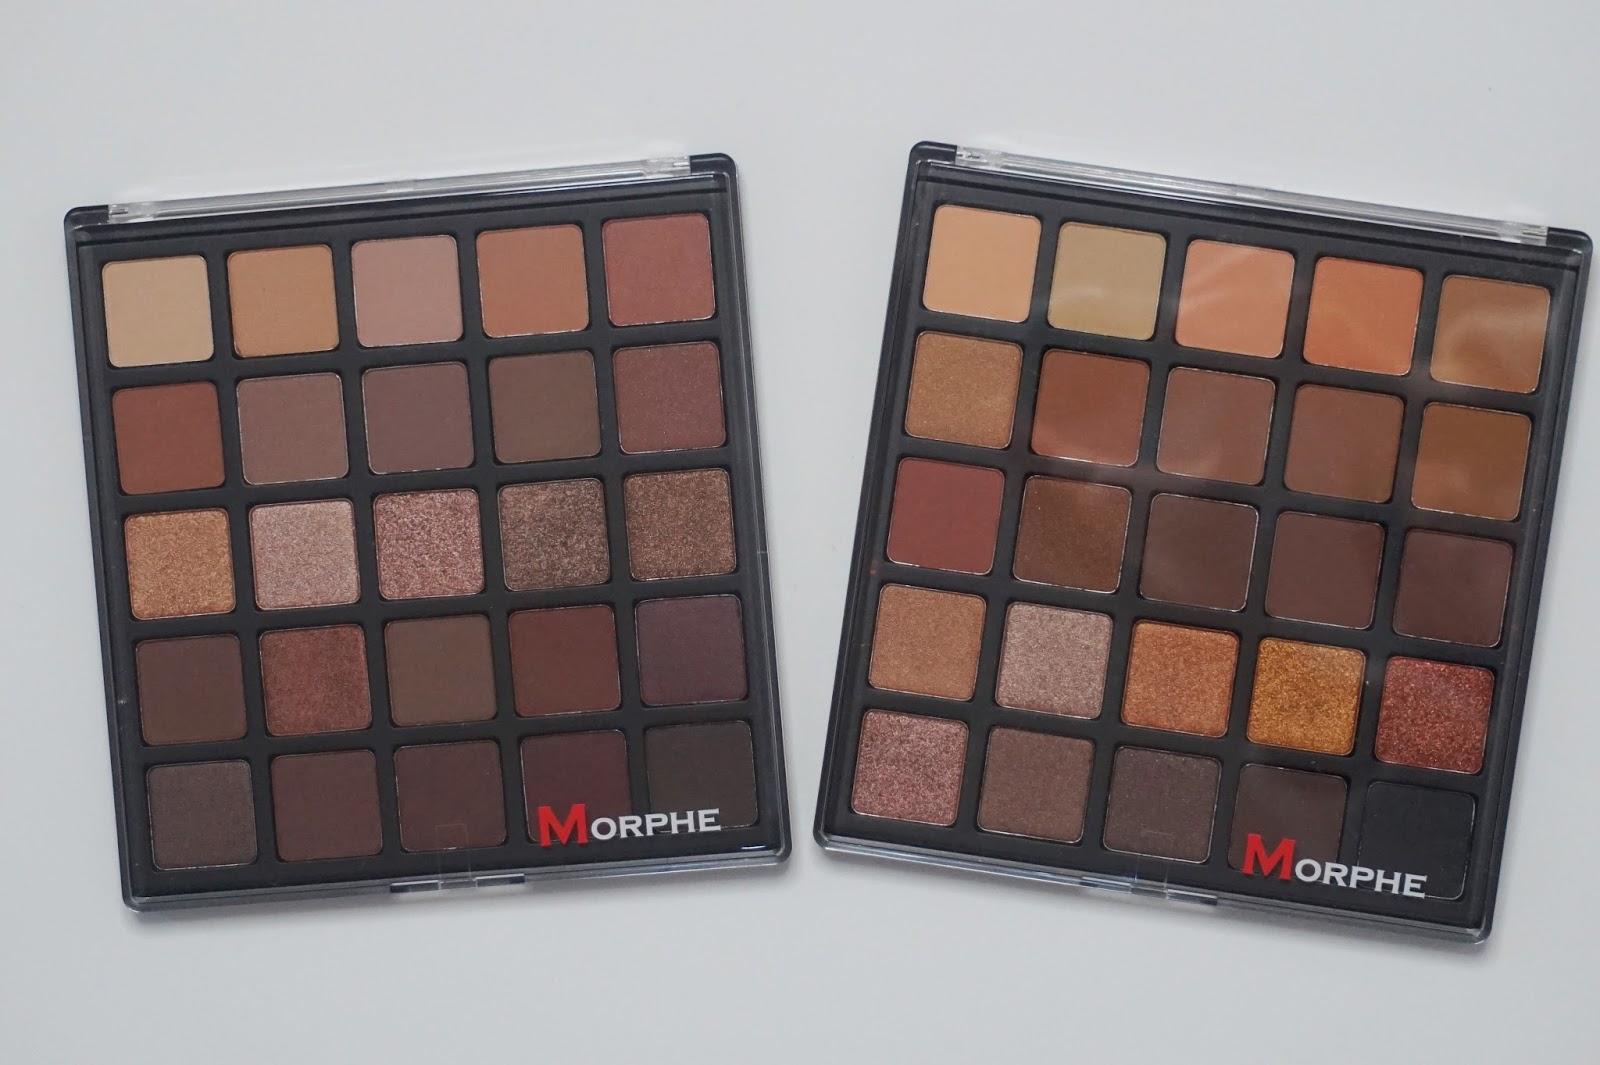 Morphe Palettes